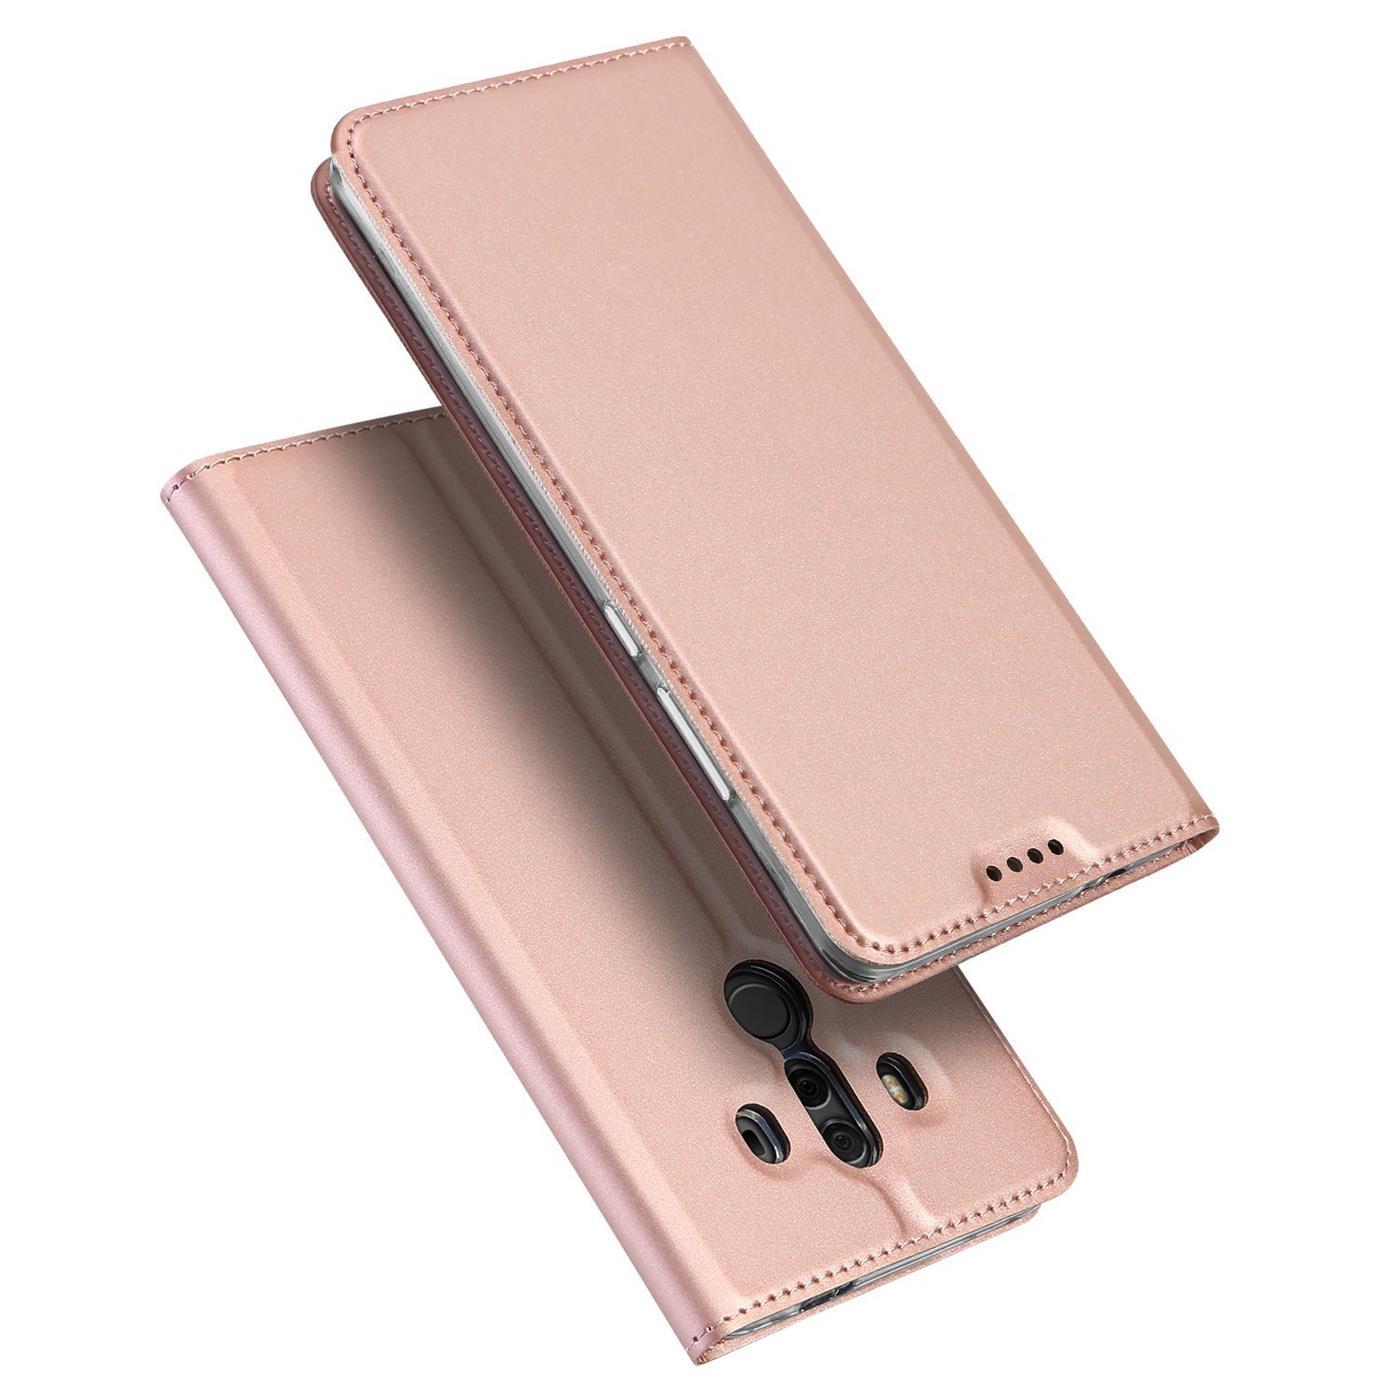 Funda-para-Movil-Huawei-Mate-10-Pro-Libro-Protectora-Slim-Flip-Estuche miniatura 15